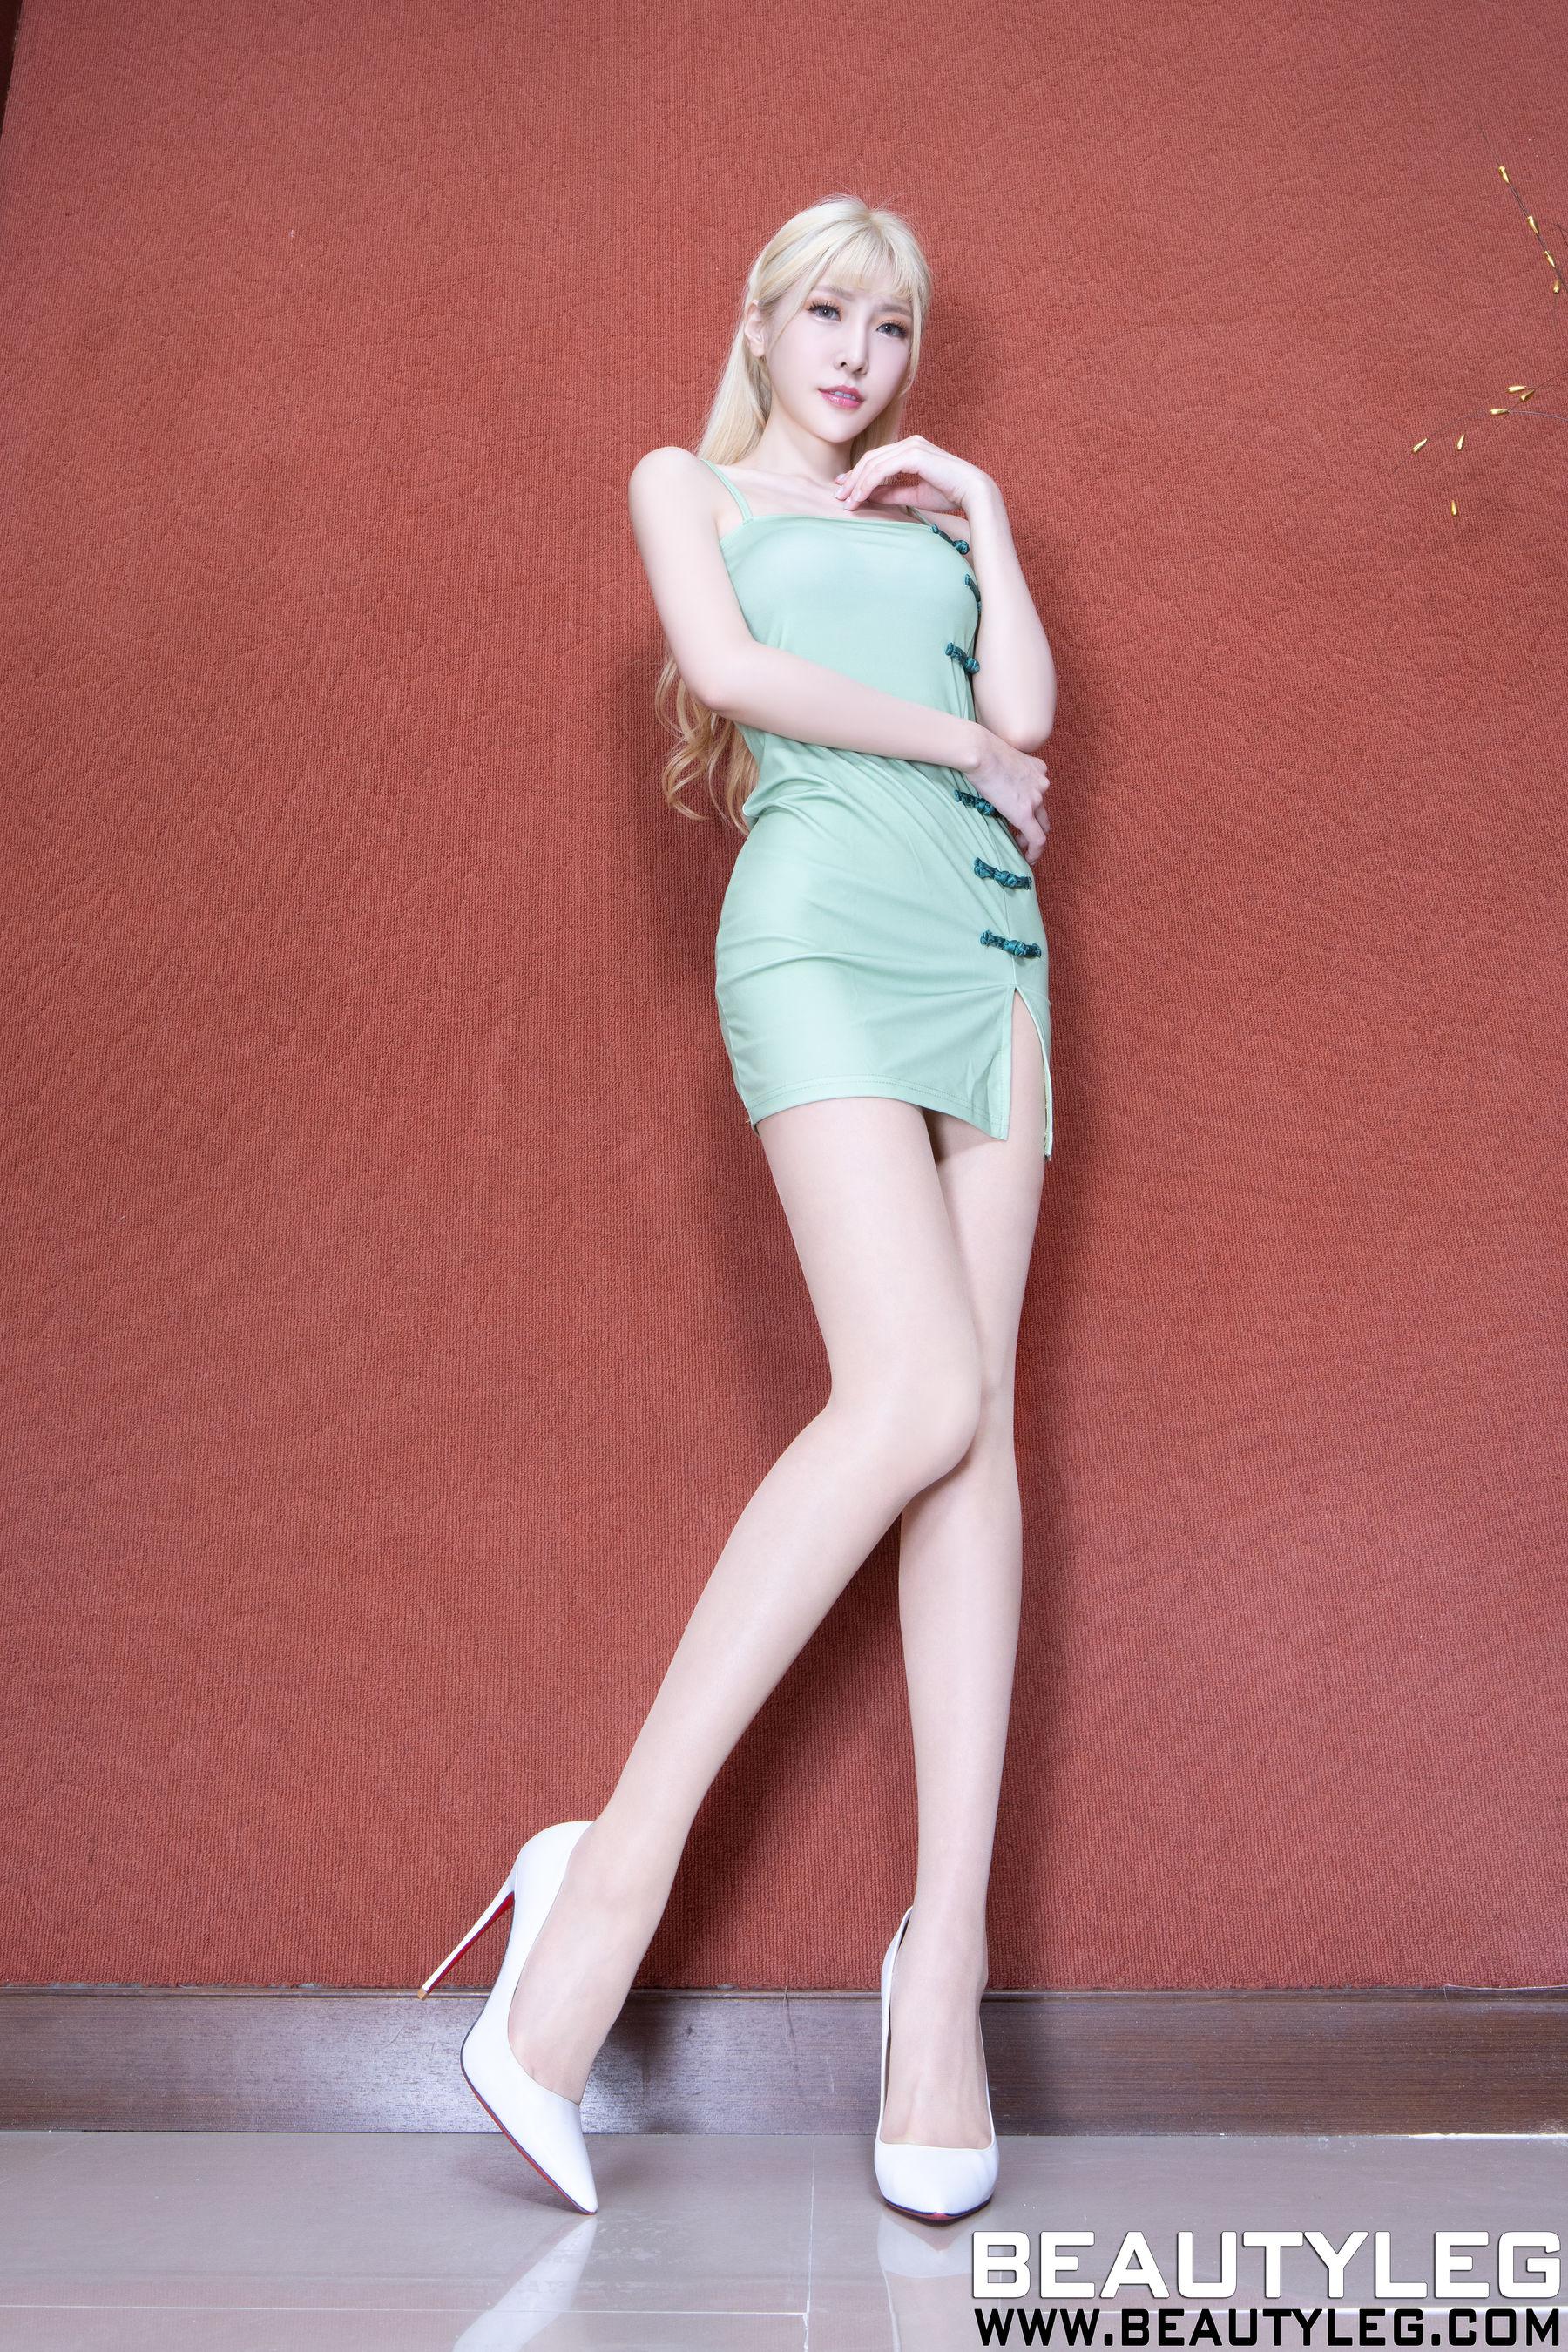 VOL.1706 [Beautyleg]金发丝袜制服:李小星(Beautyleg腿模Xin)超高清个人性感漂亮大图(43P)